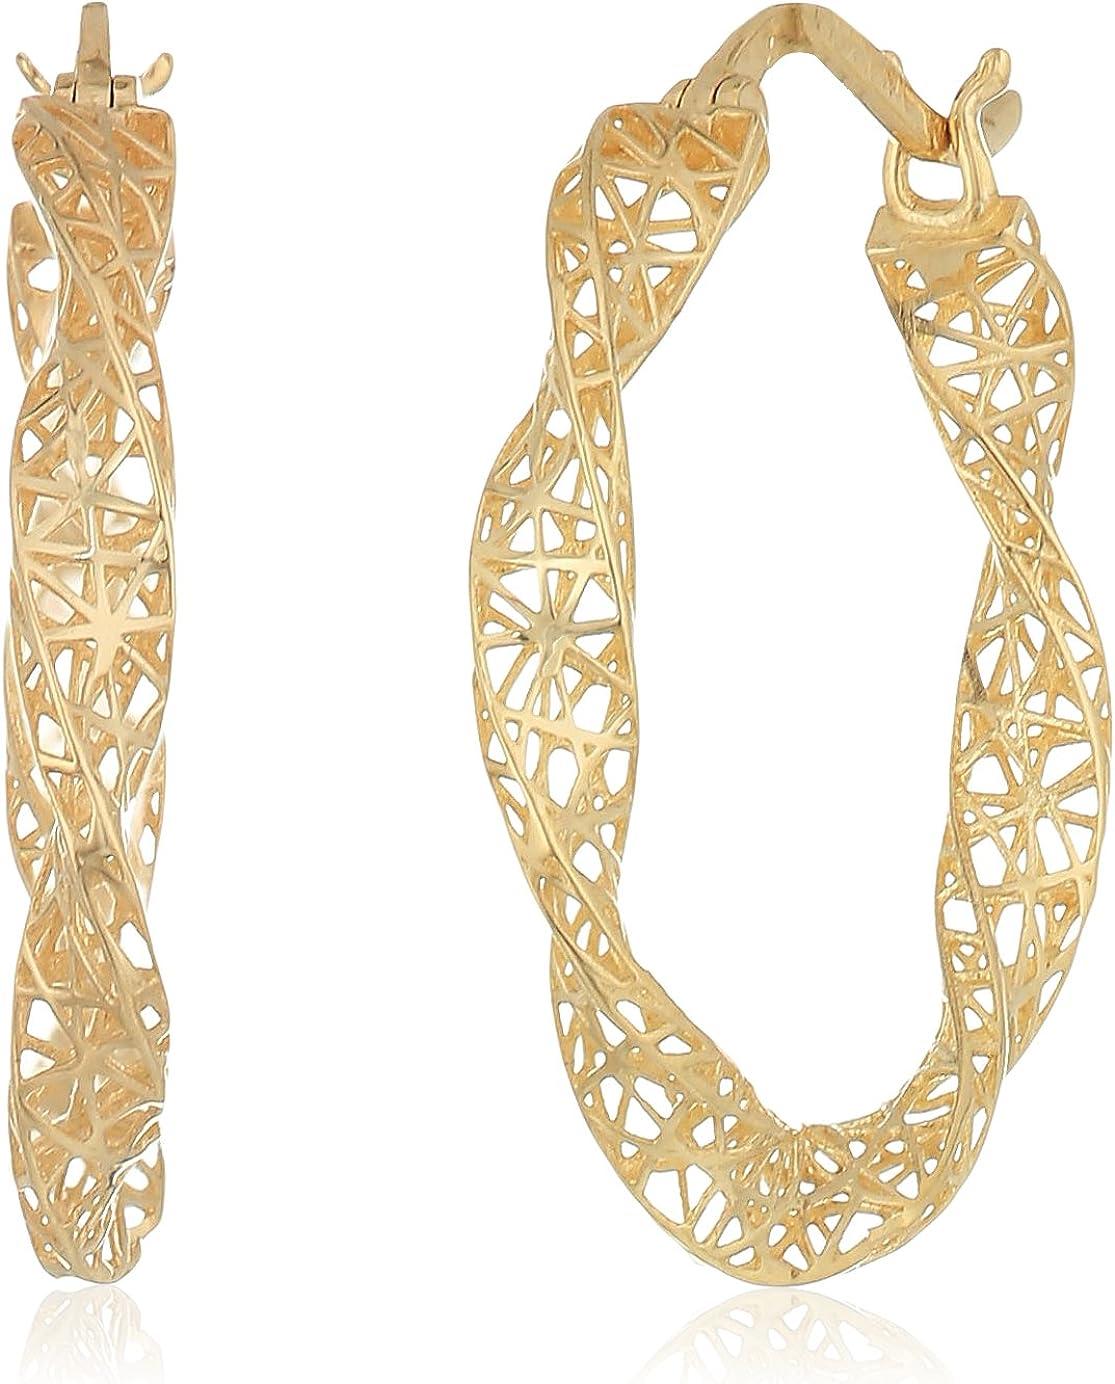 14k Yellow Gold Twist with Micro-Filigree Texture Hoop Earrings